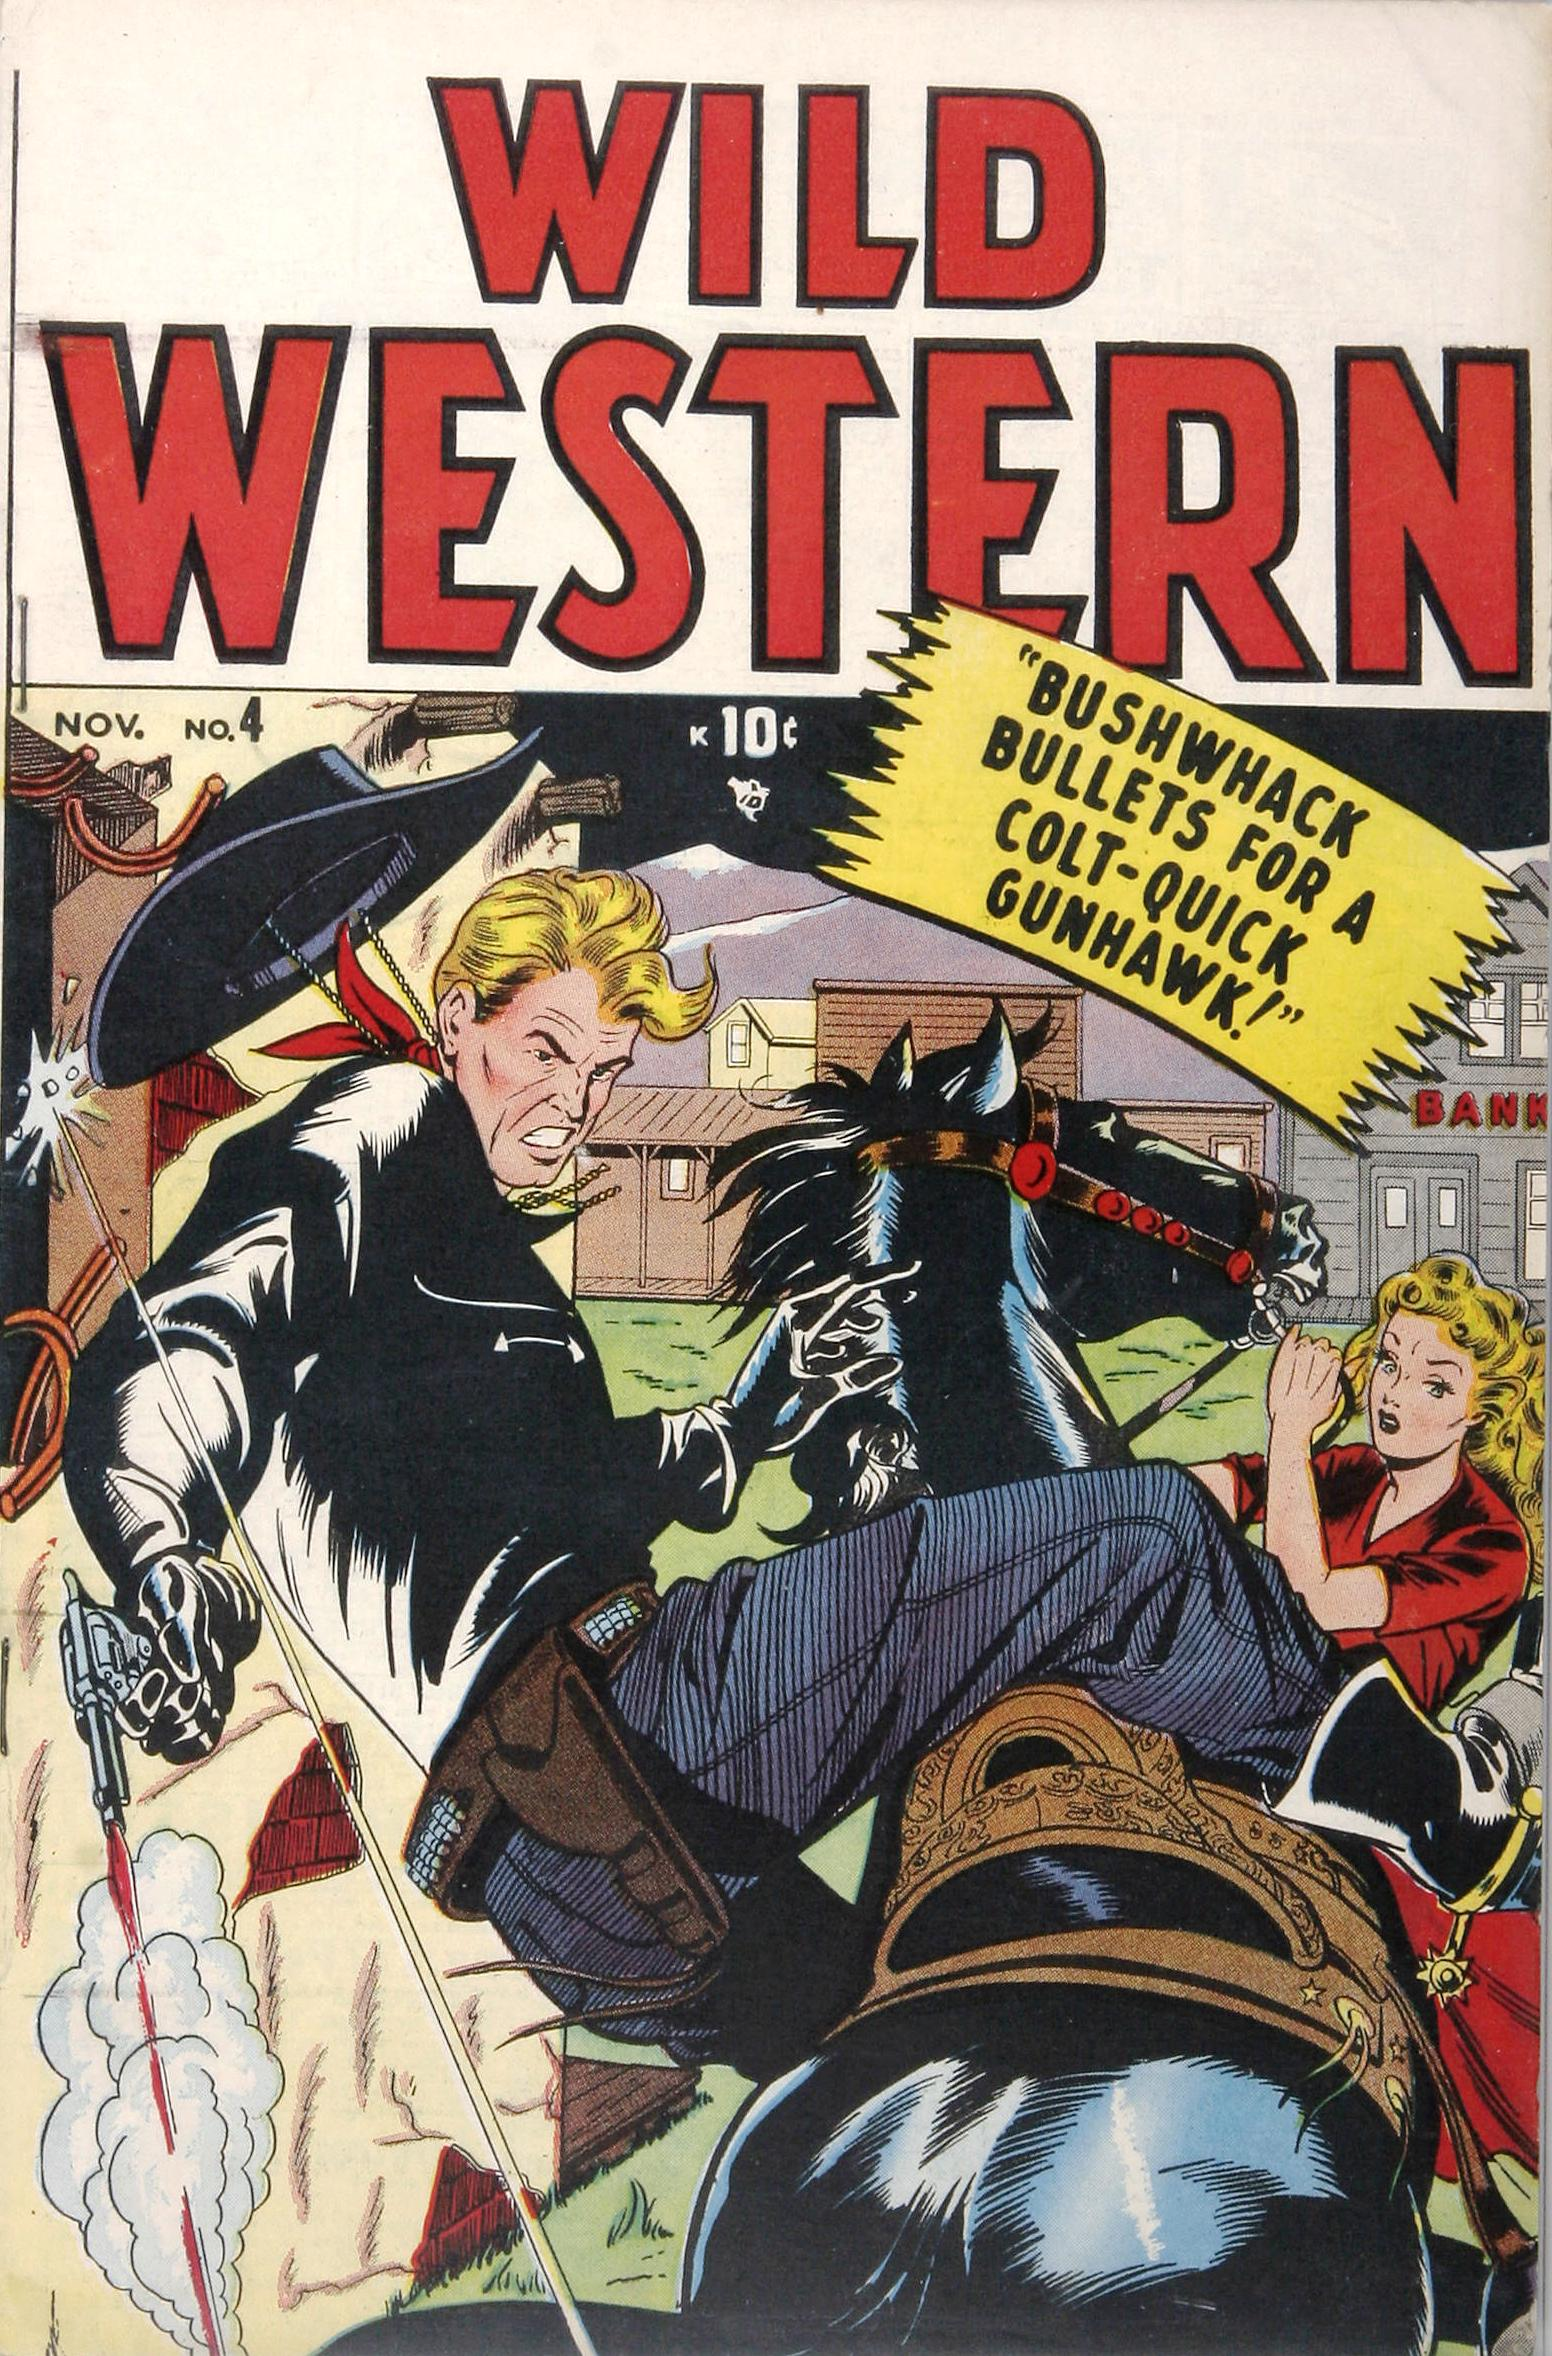 Wild Western 4 Story Image